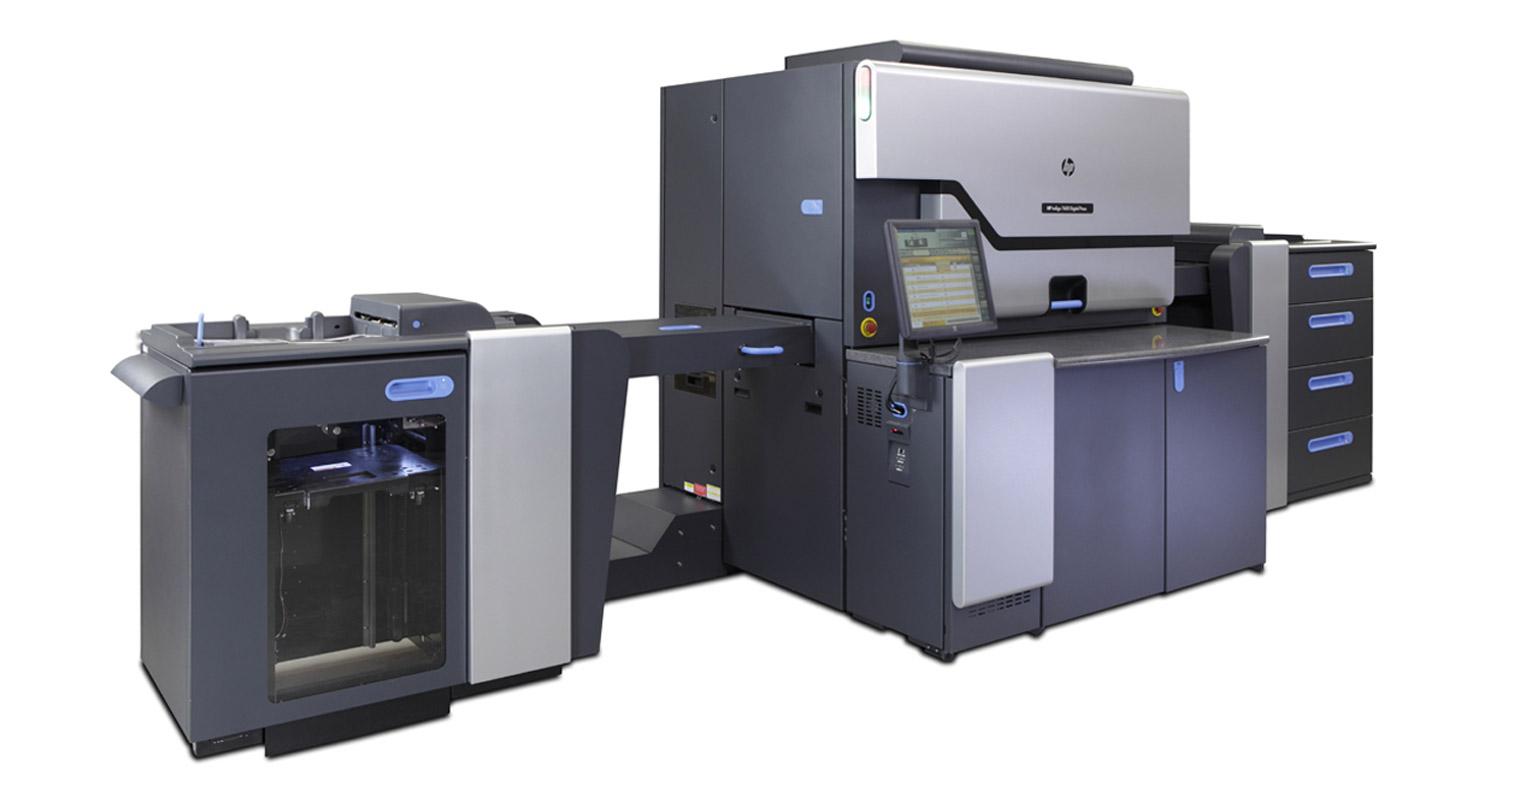 Prensa digital HP Indigo 7600